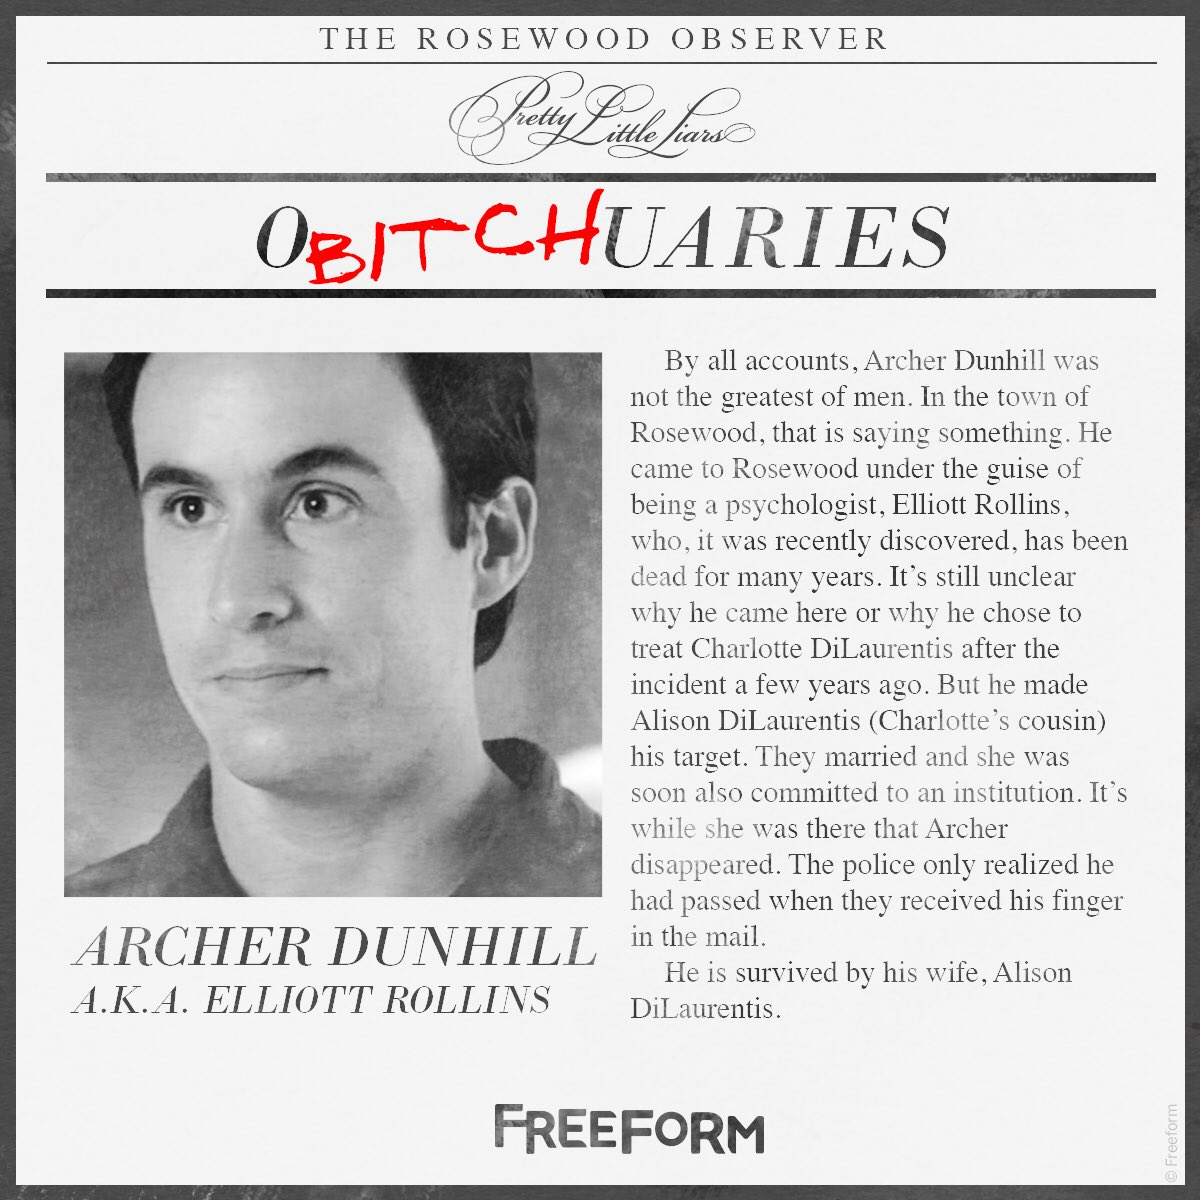 Archer Dunhill